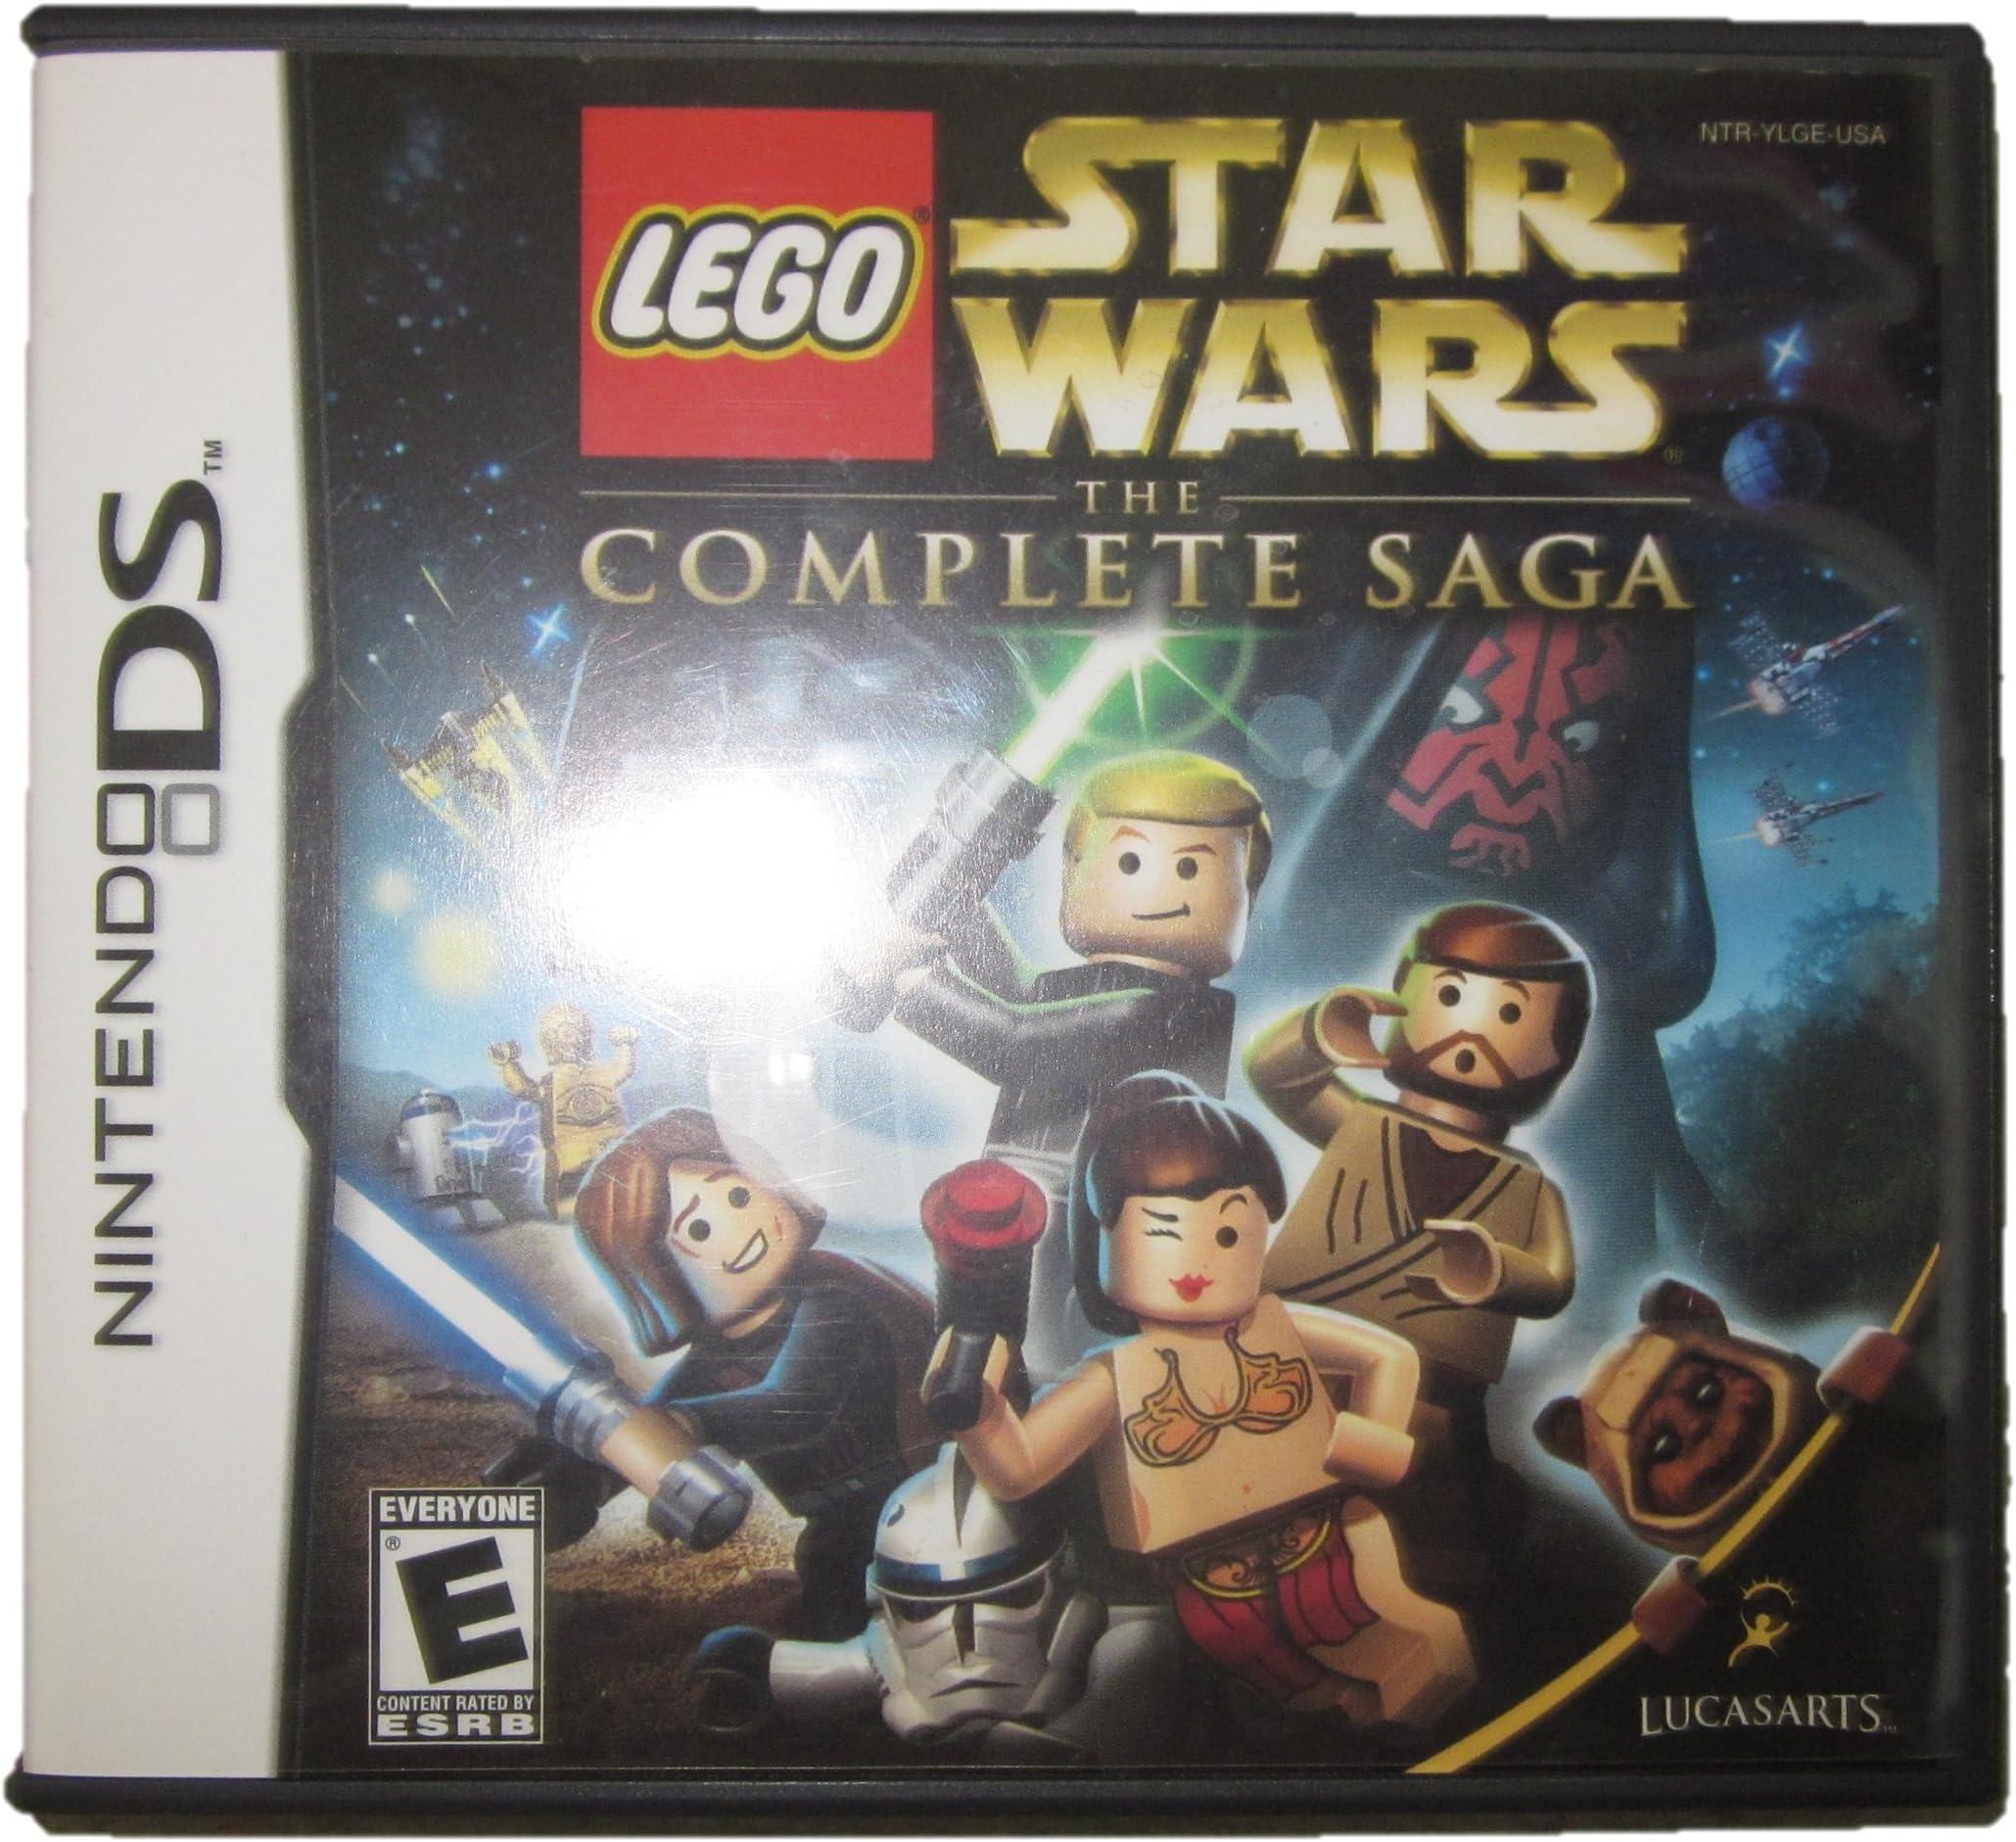 amazon com lego star wars the complete saga nintendo ds case and rh amazon com lego star wars wii guide lego star wars wii guide